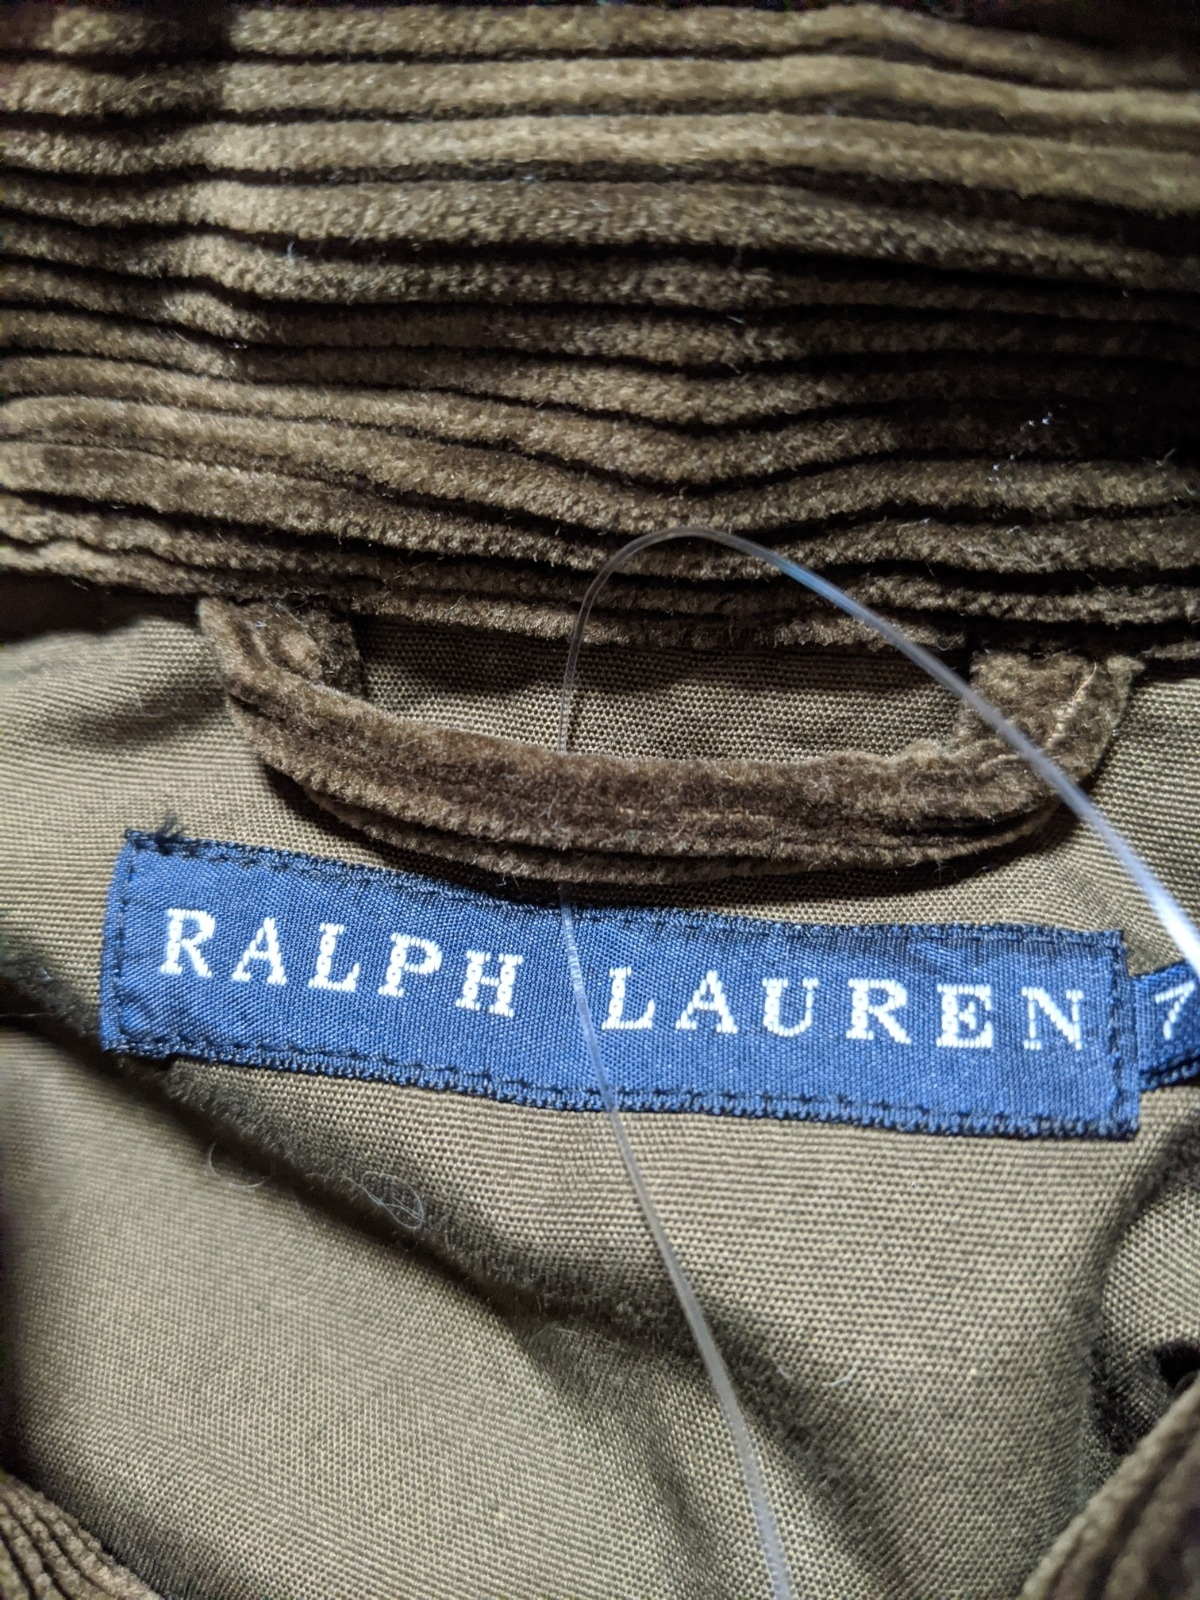 RalphLauren(ラルフローレン)のブルゾン